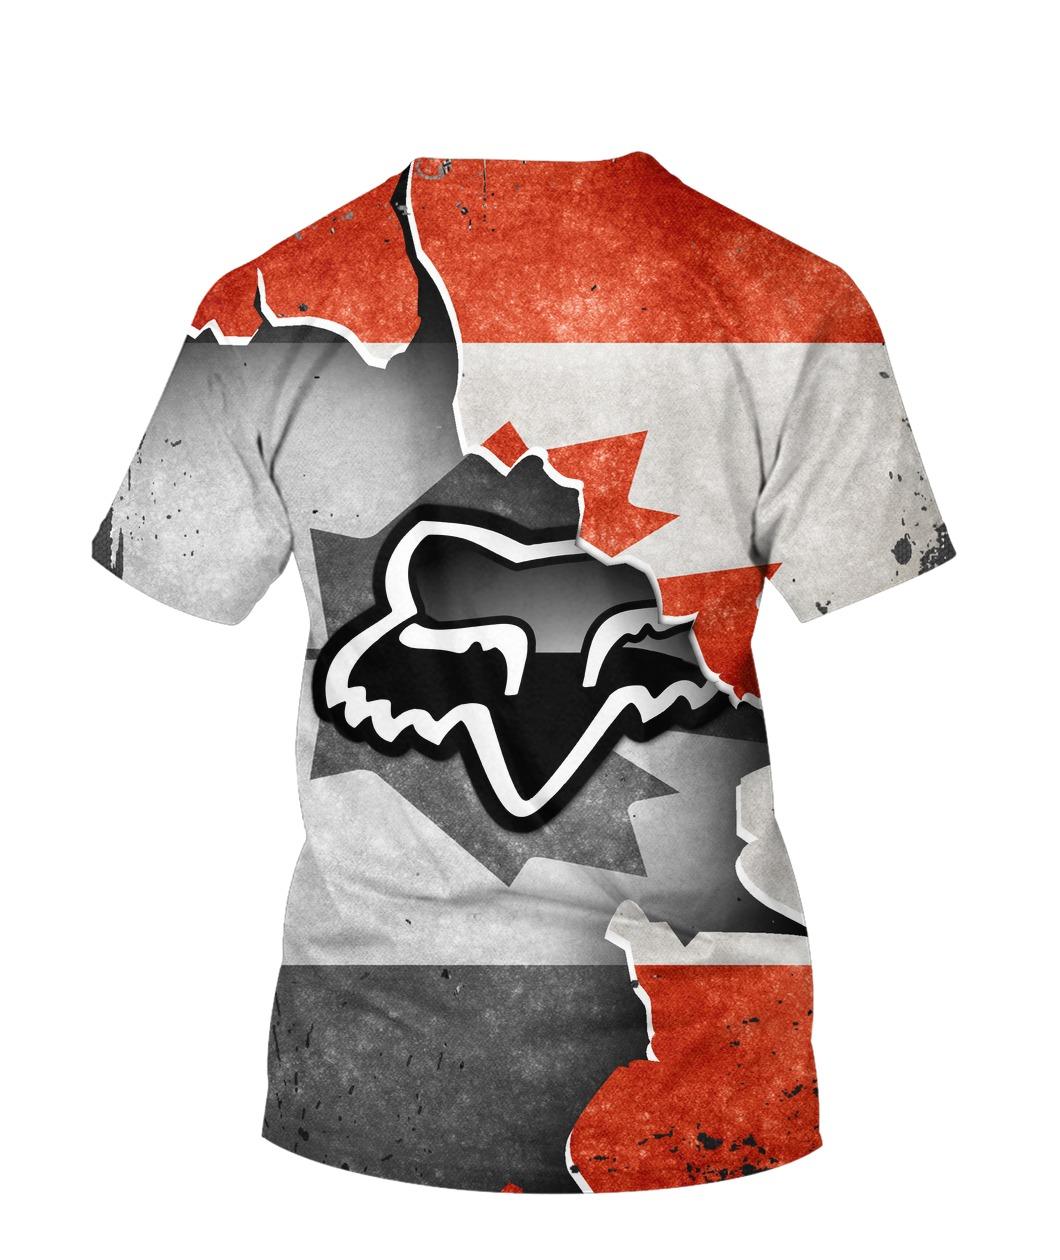 Fox racing in canada flag full printing tshirt 1